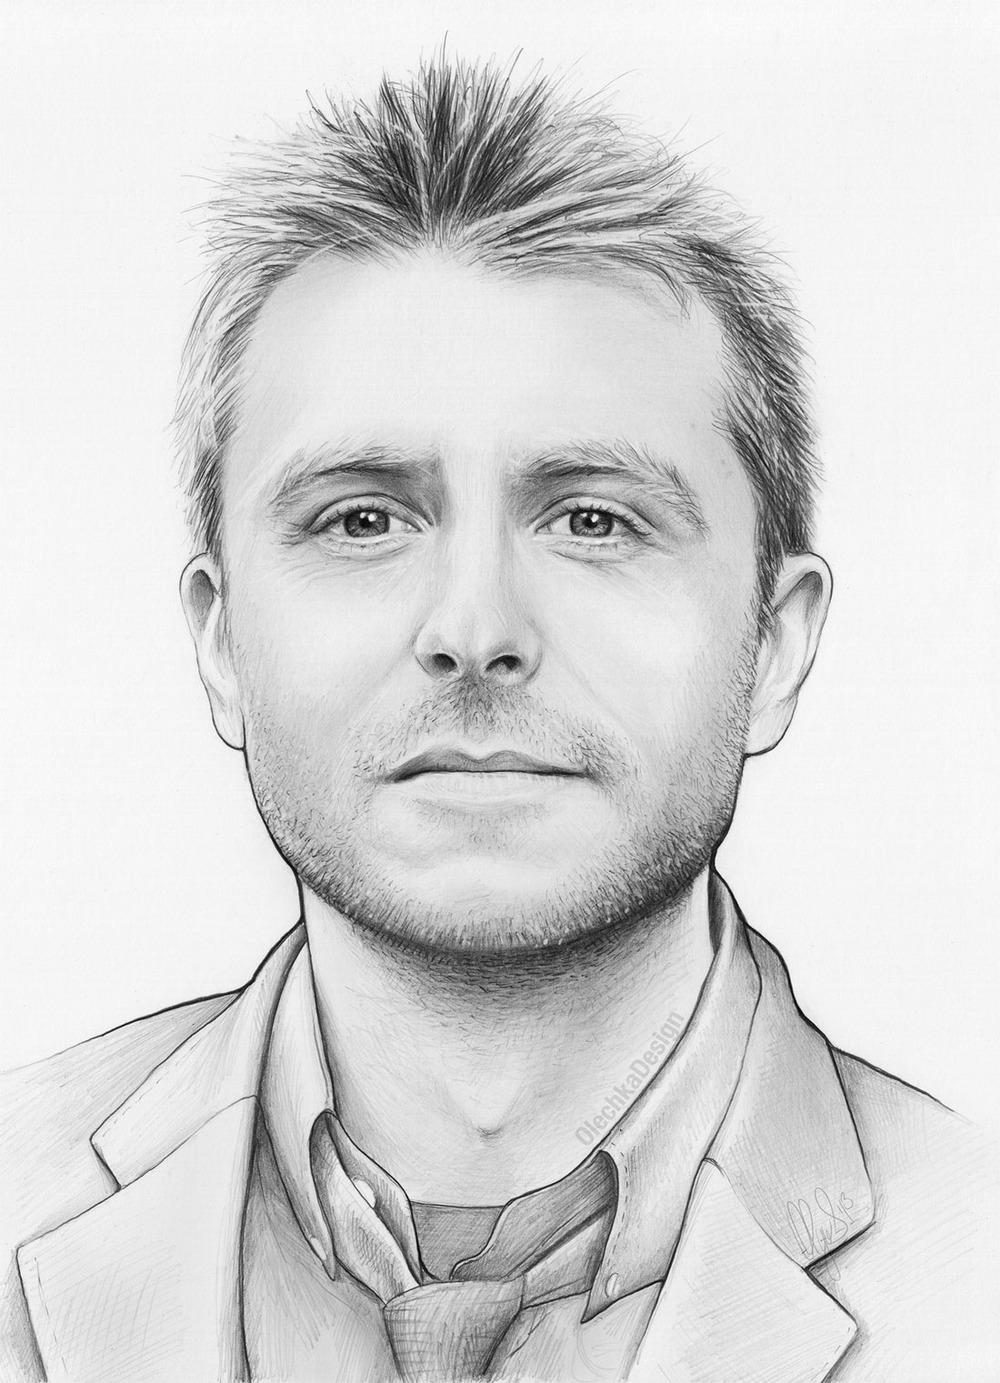 chris-hardwick-portrait.jpg